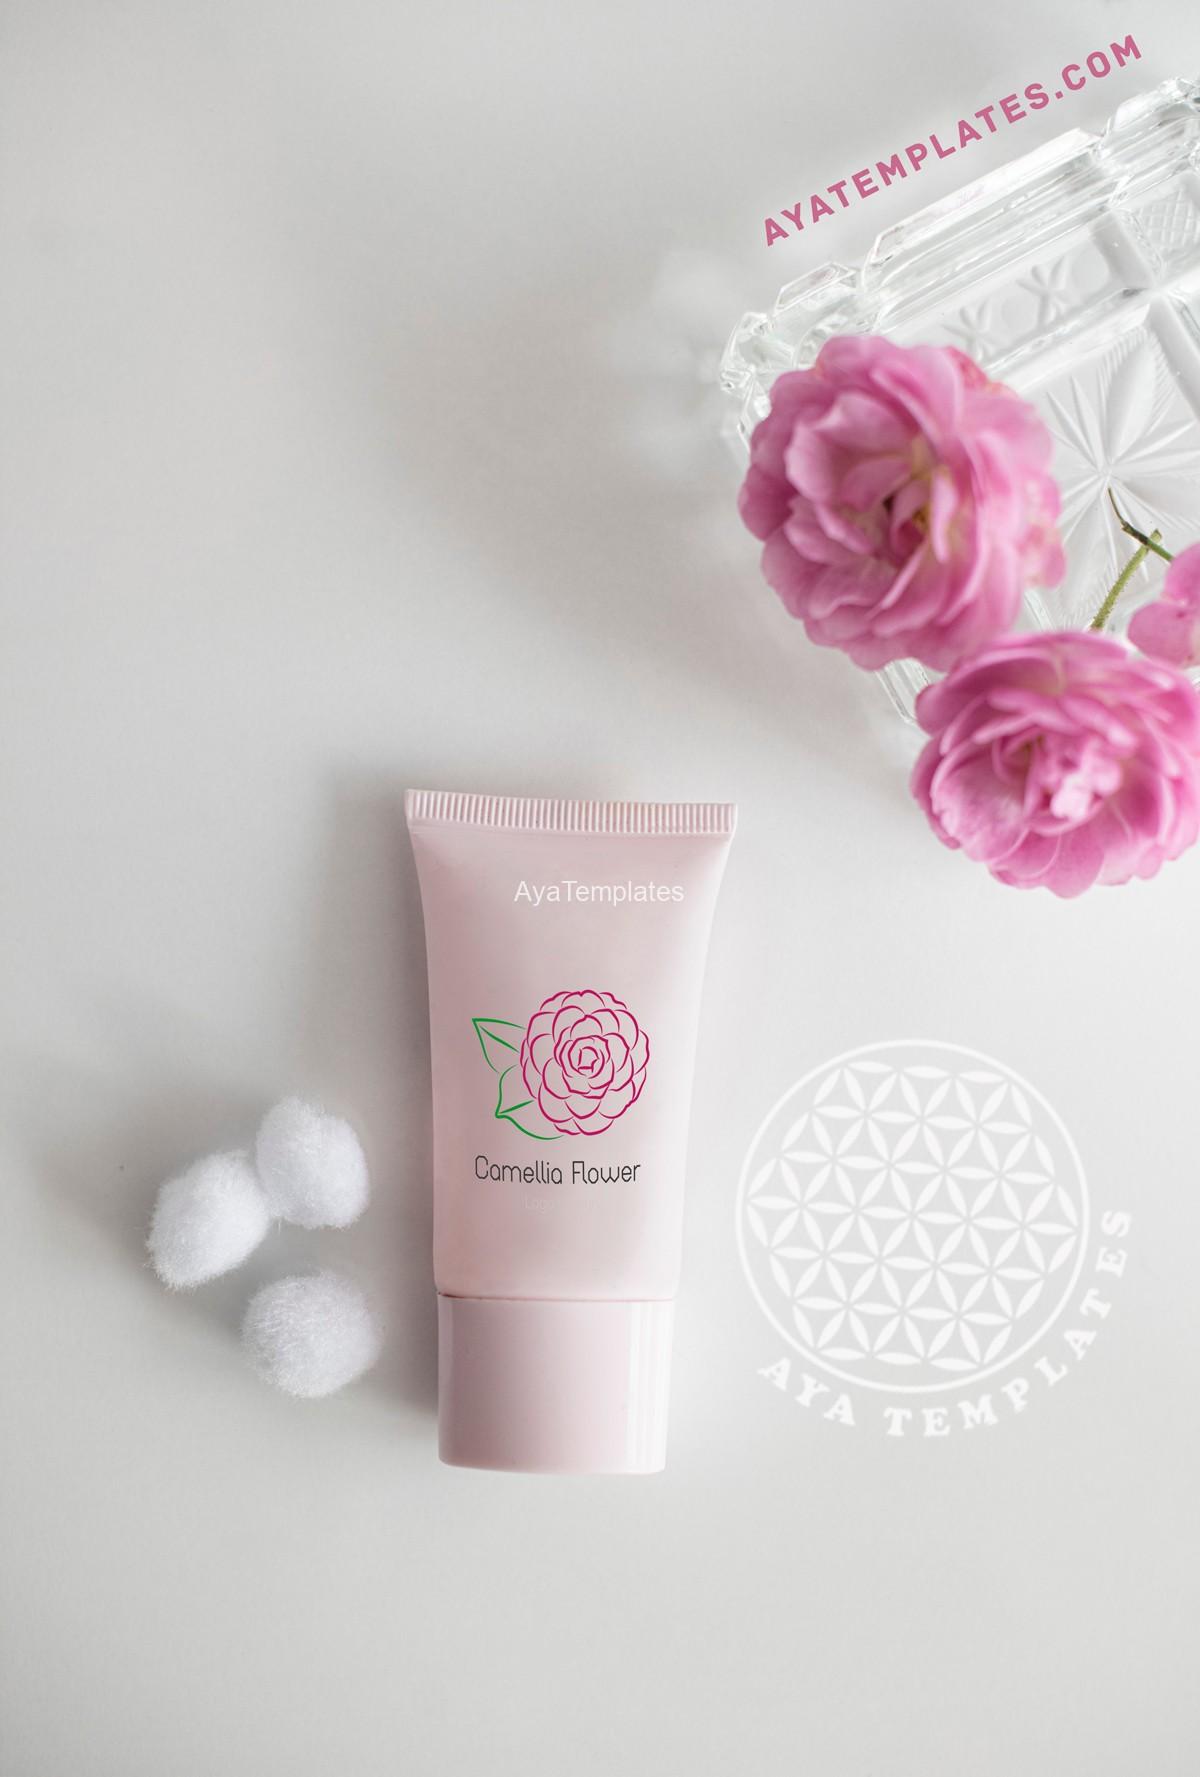 camellia-flower-logo-design-brand-identity-mockup-ayatemplates